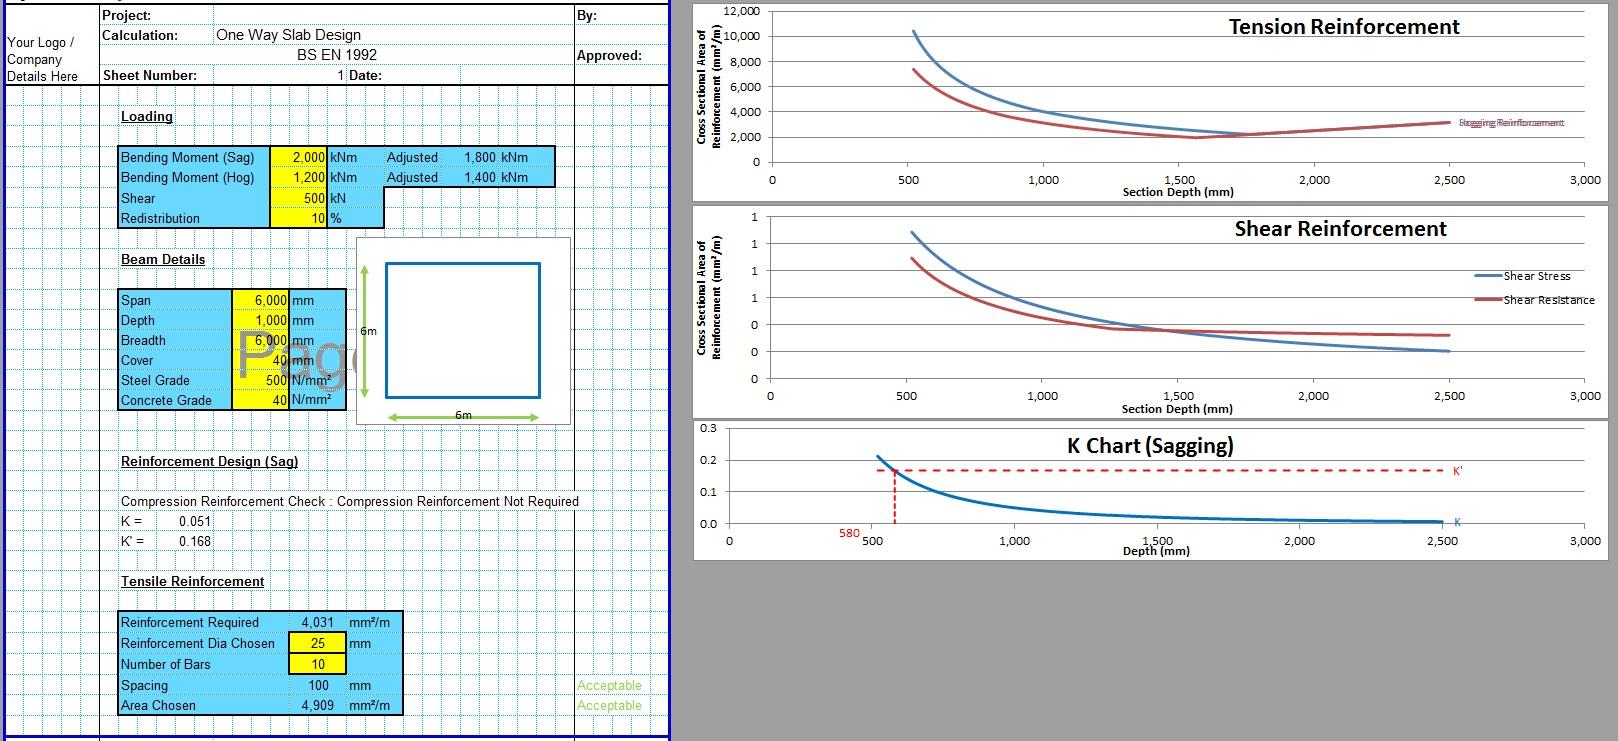 One Way Slab Design Spreadsheet1